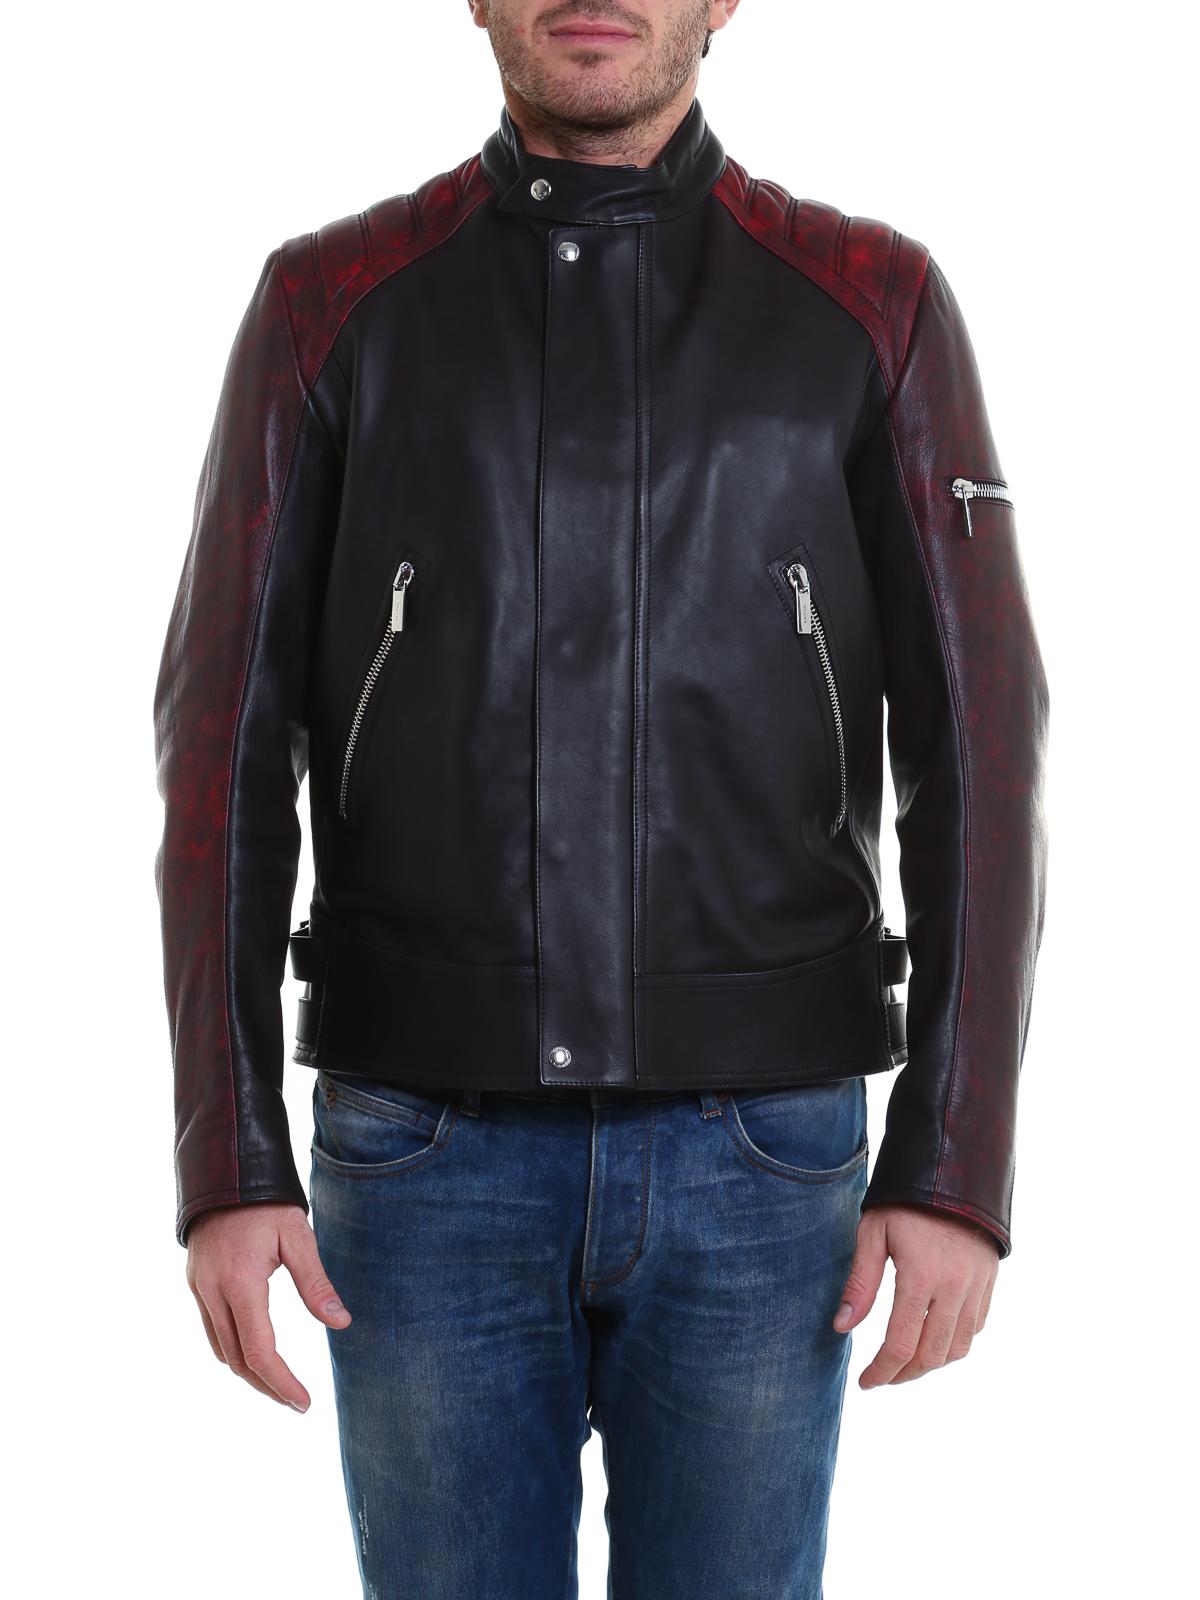 low cost f091b 35e27 Dior - レザーコート メンズ - 黒 - レザージャケット ...